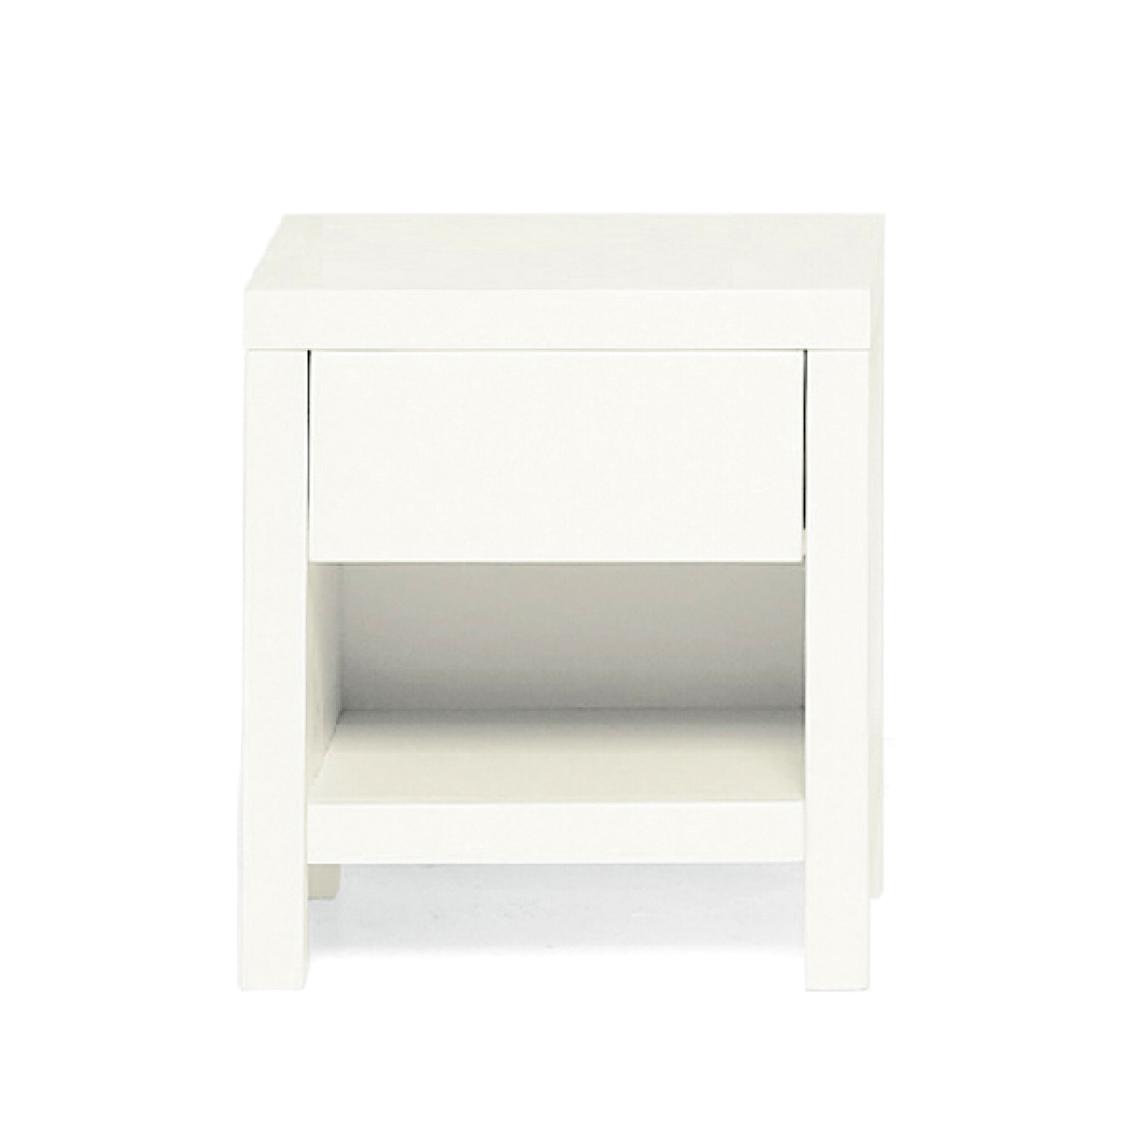 vente priv e quax. Black Bedroom Furniture Sets. Home Design Ideas